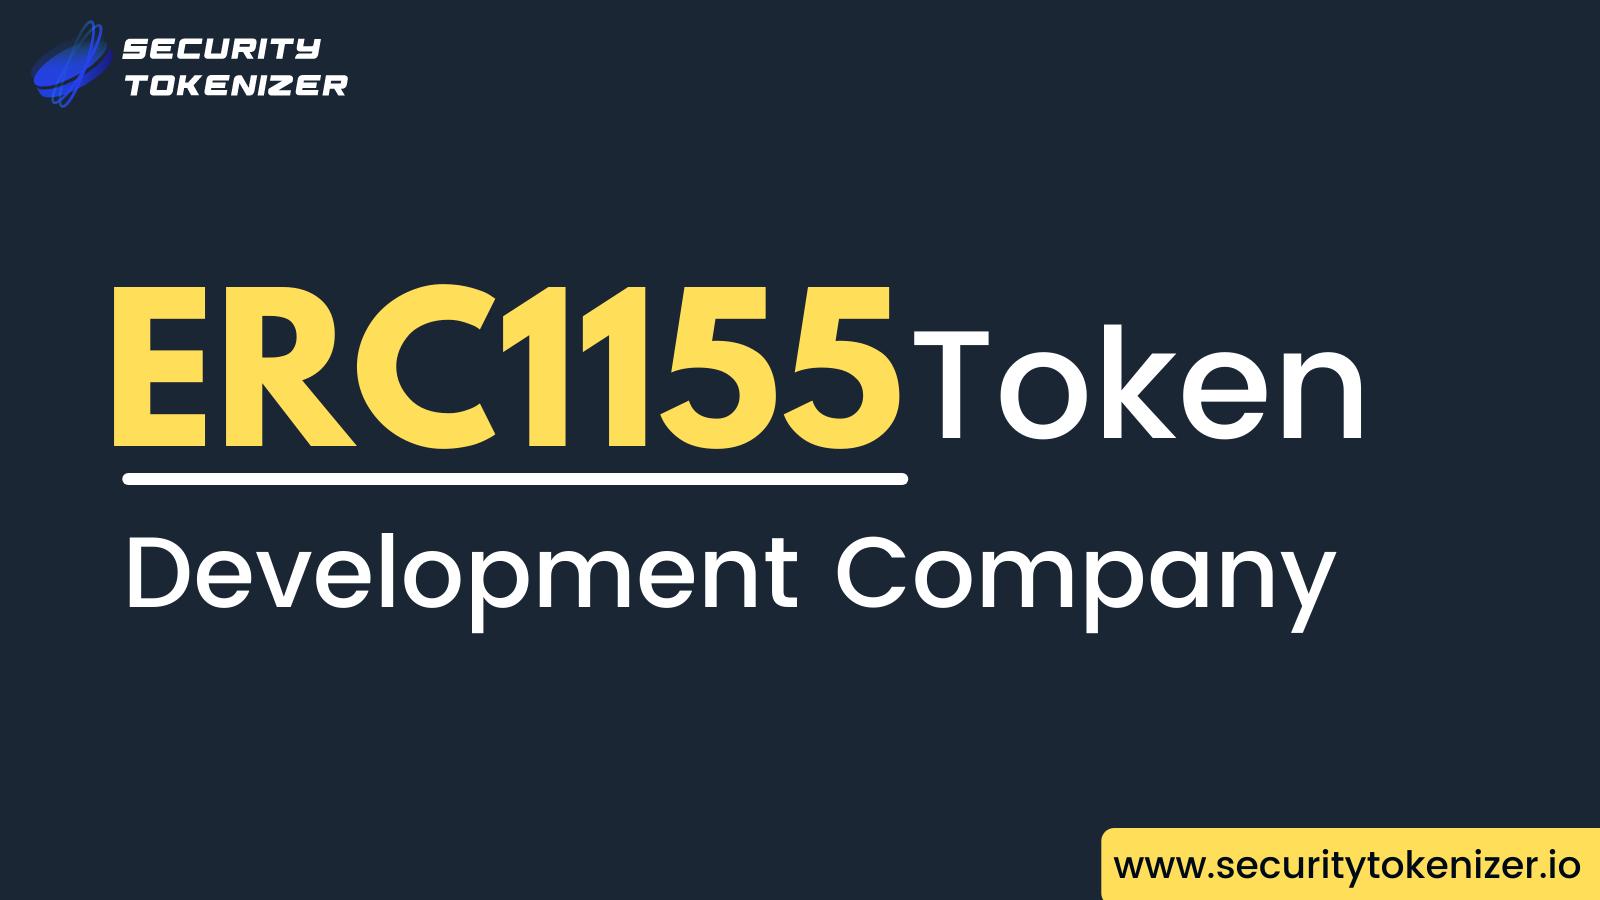 ERC1155 Token Development Company